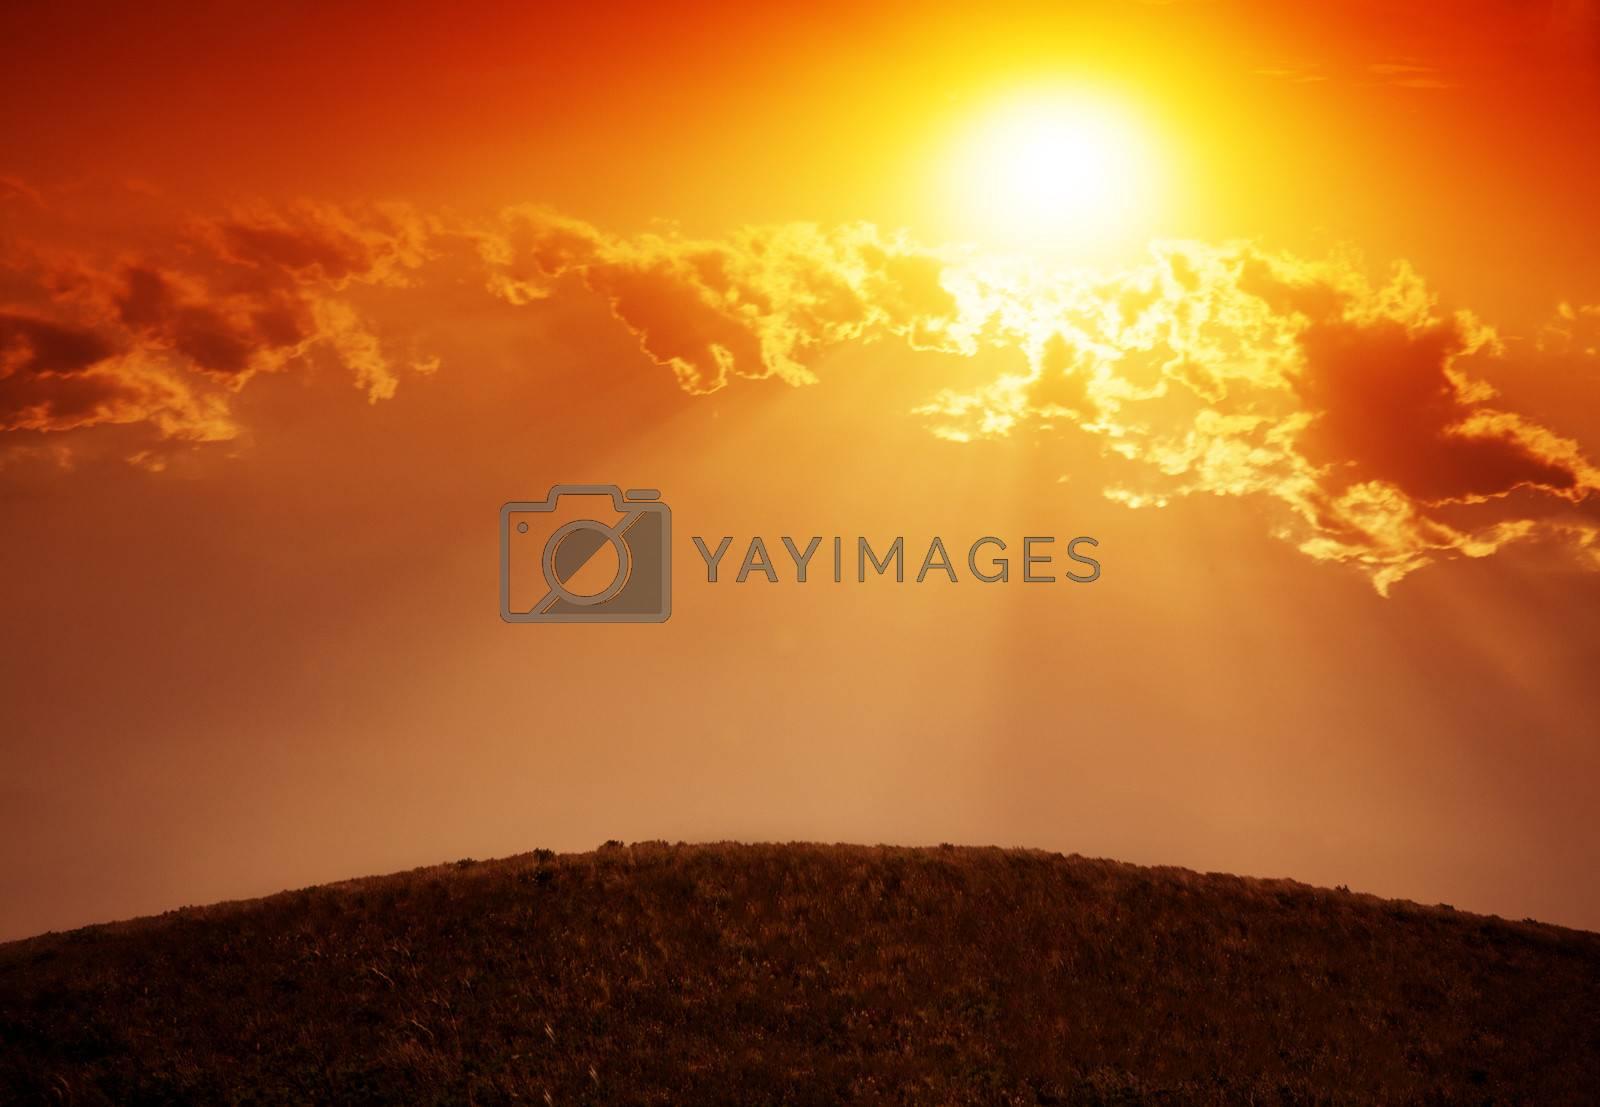 Landscape with sun shining through clouds. by XiXinXing